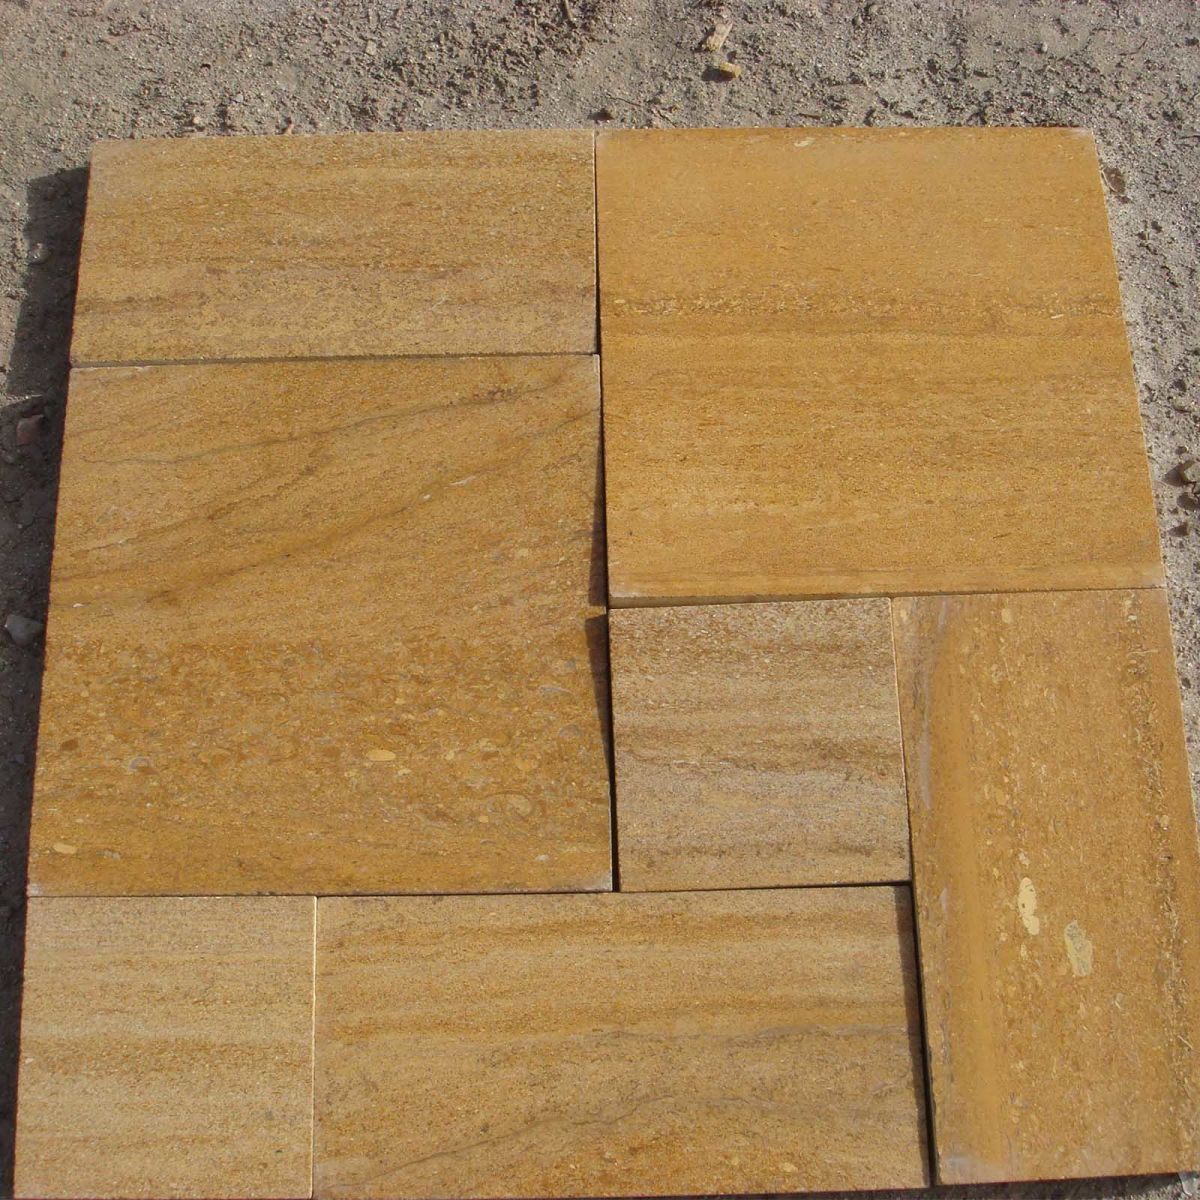 Ita Gold Sandstone From Certified Exporter Supplier